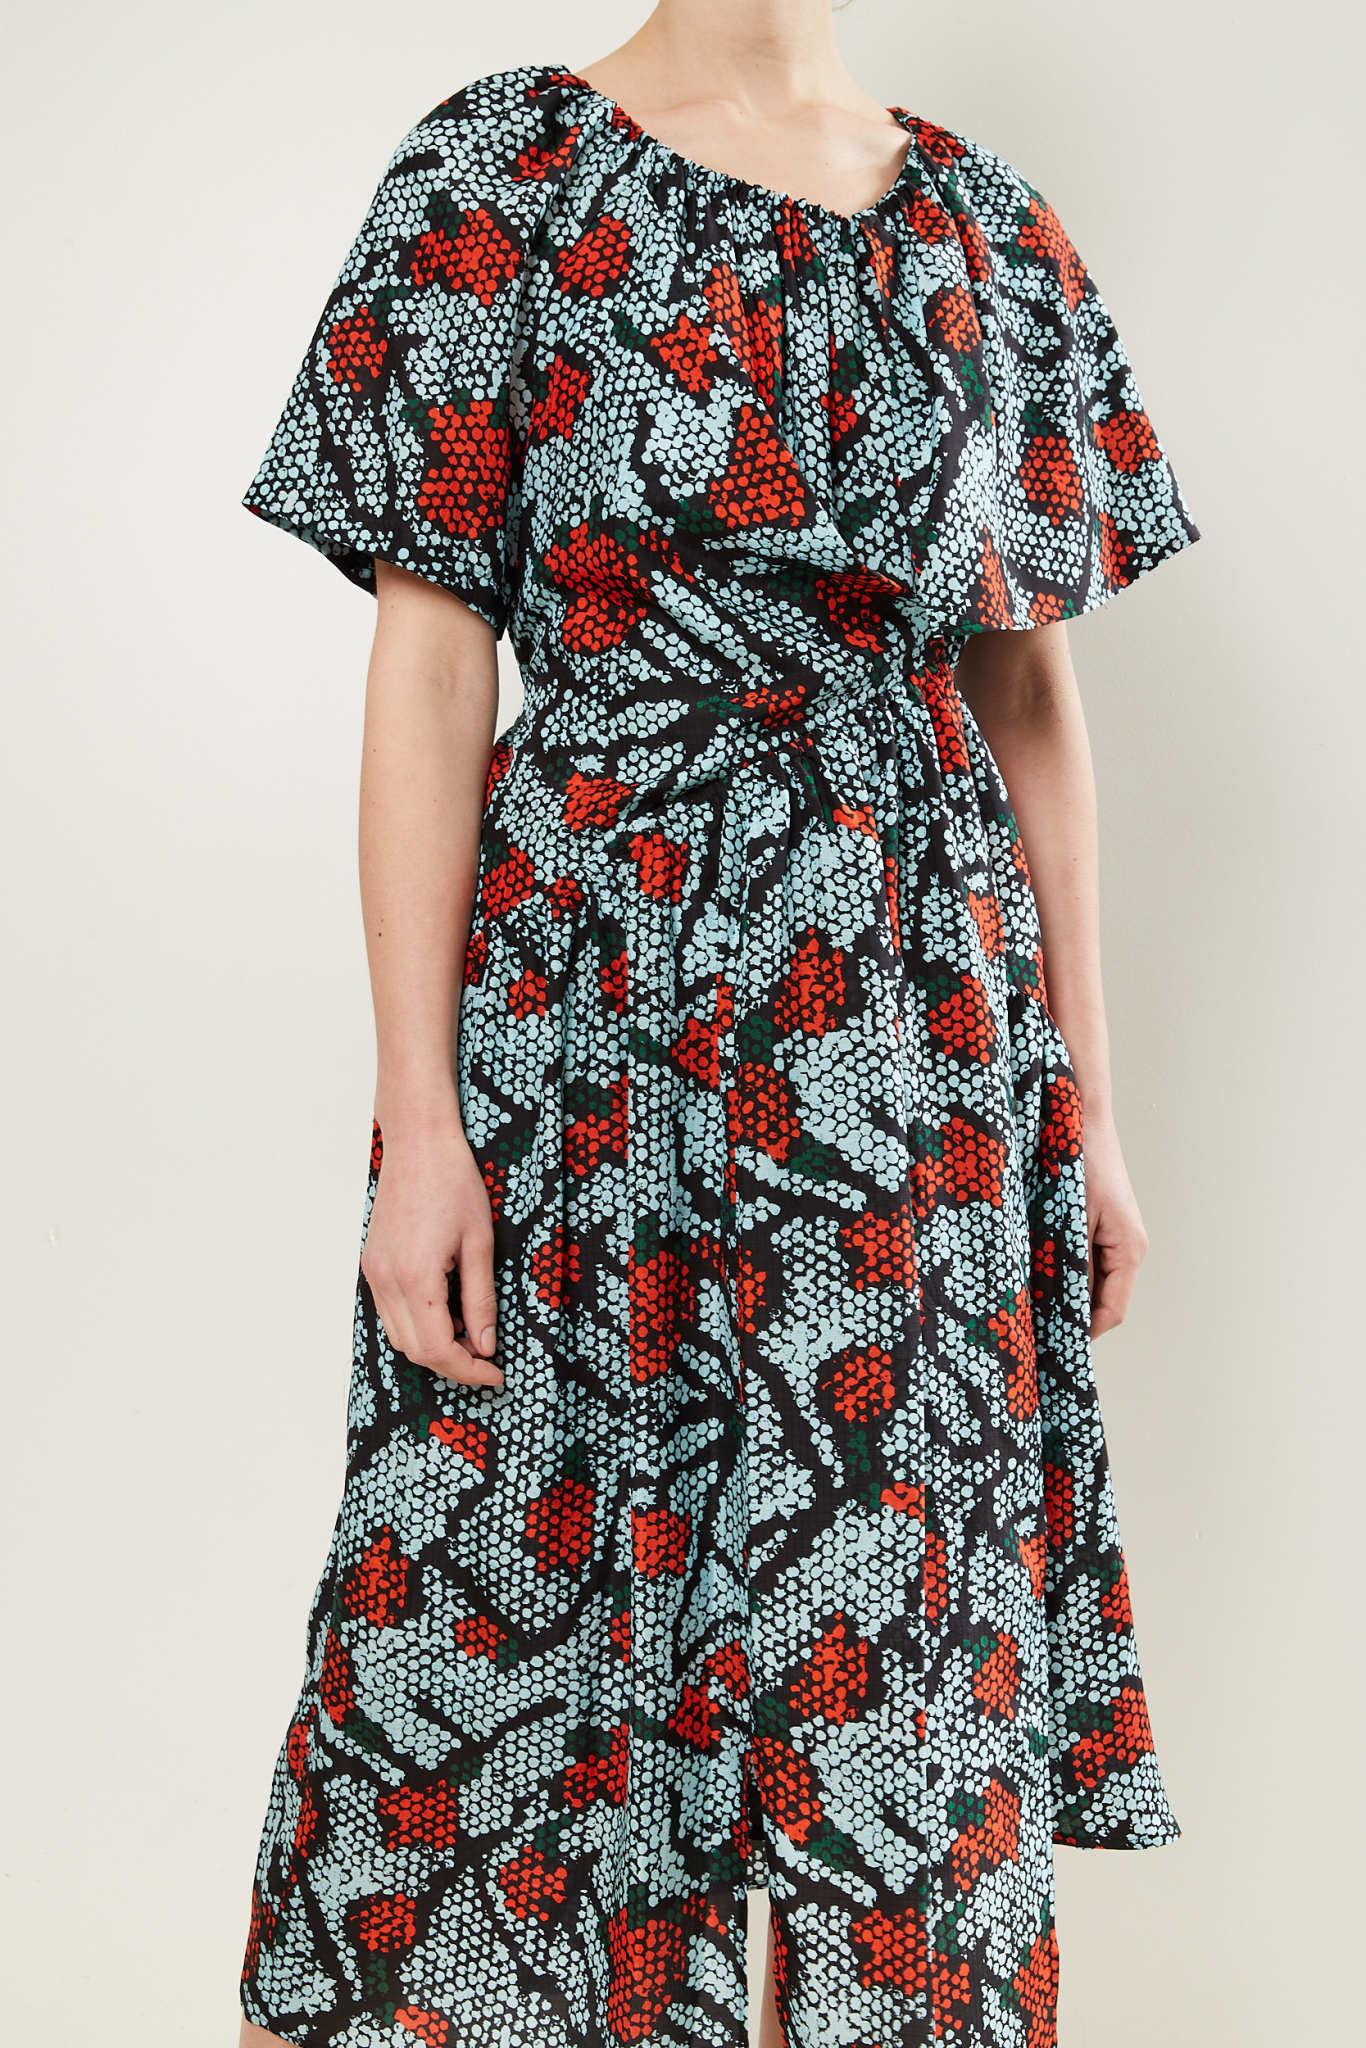 Christian Wijnants - Damba silk iris dress